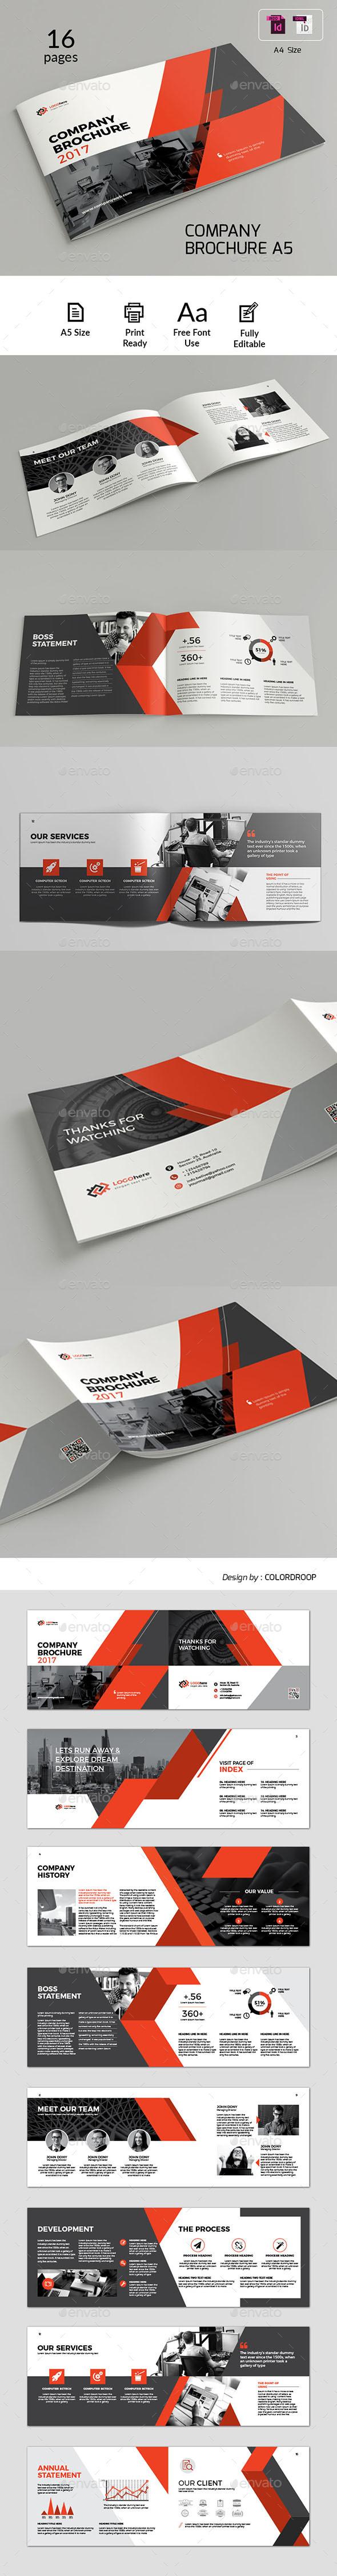 A5 Landscape Brochure - Corporate Brochures